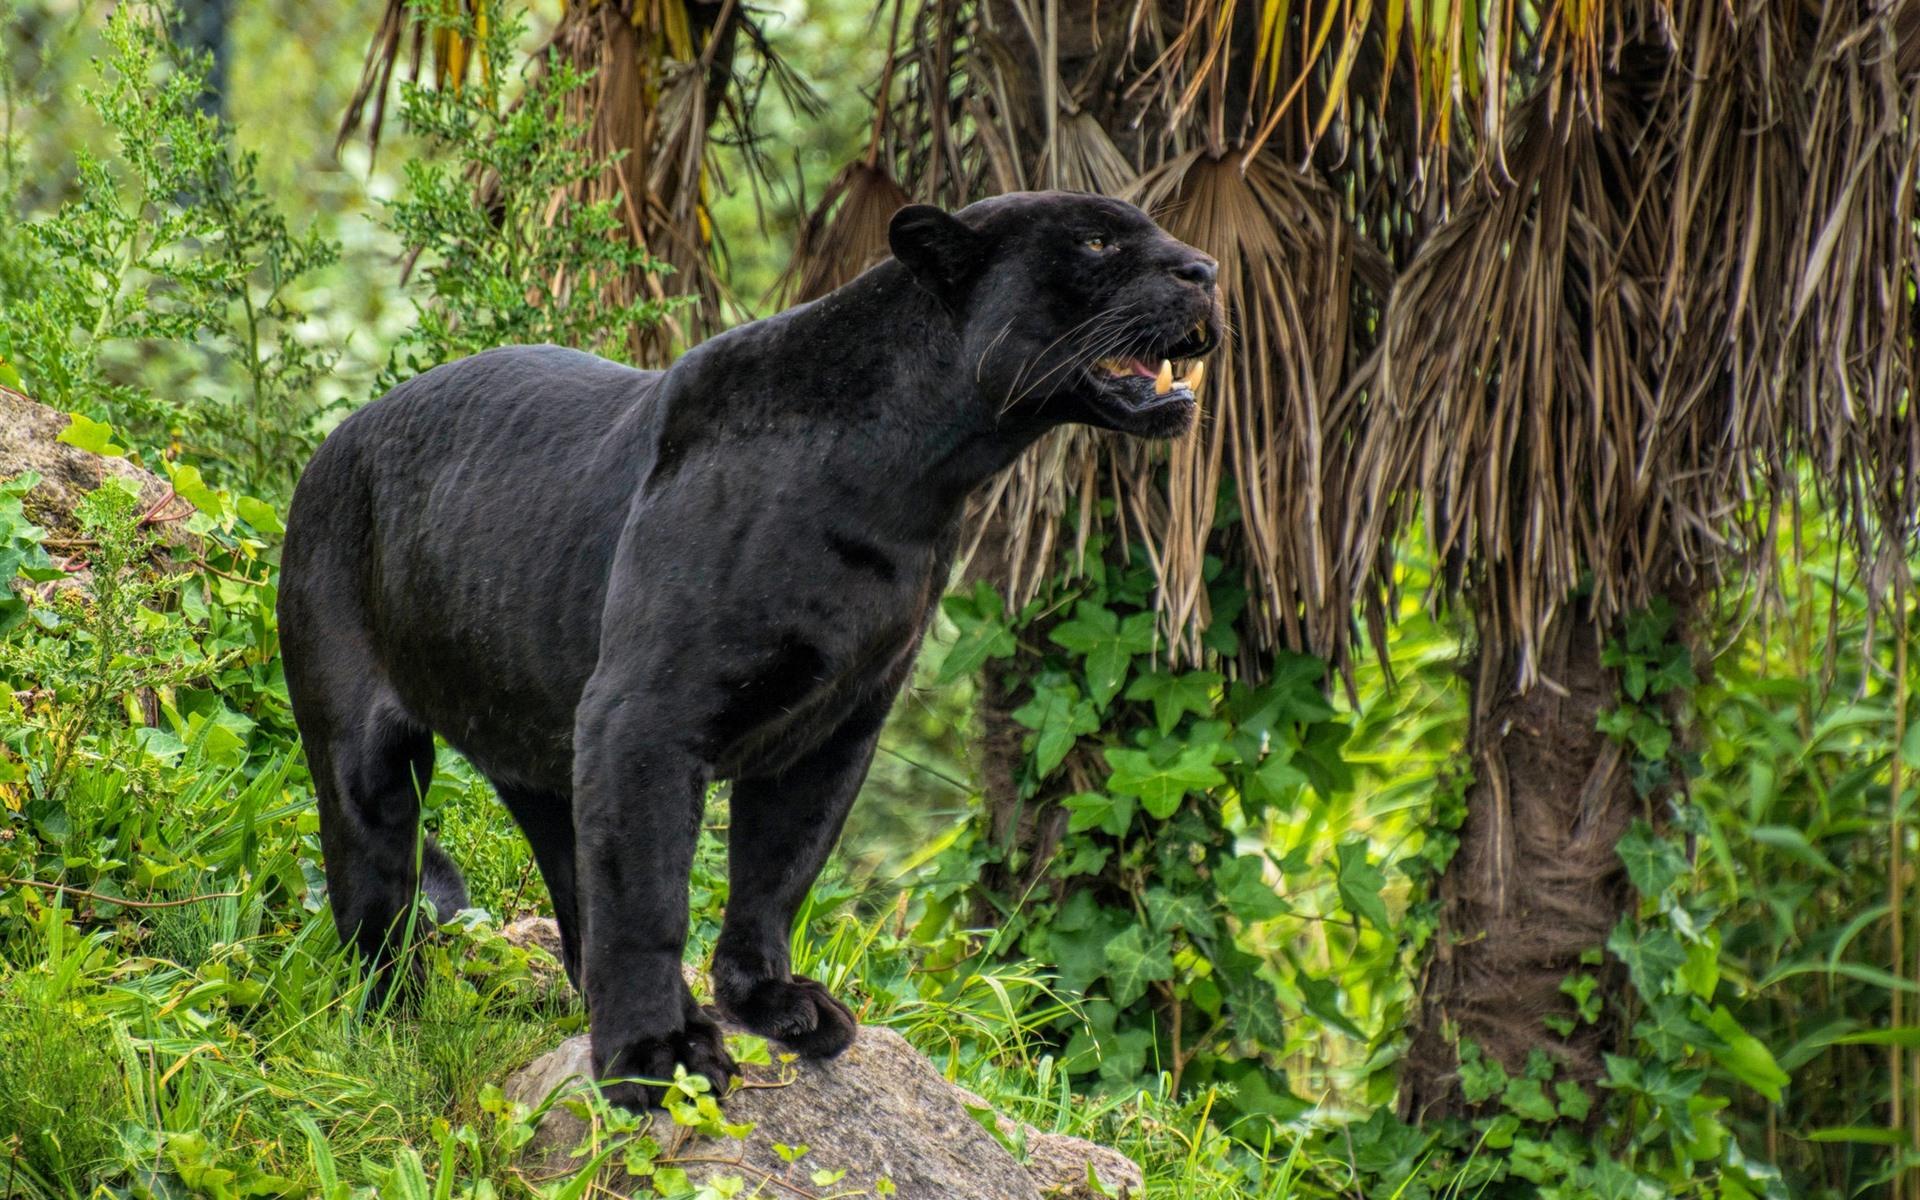 Картинки джунгли с пантерами